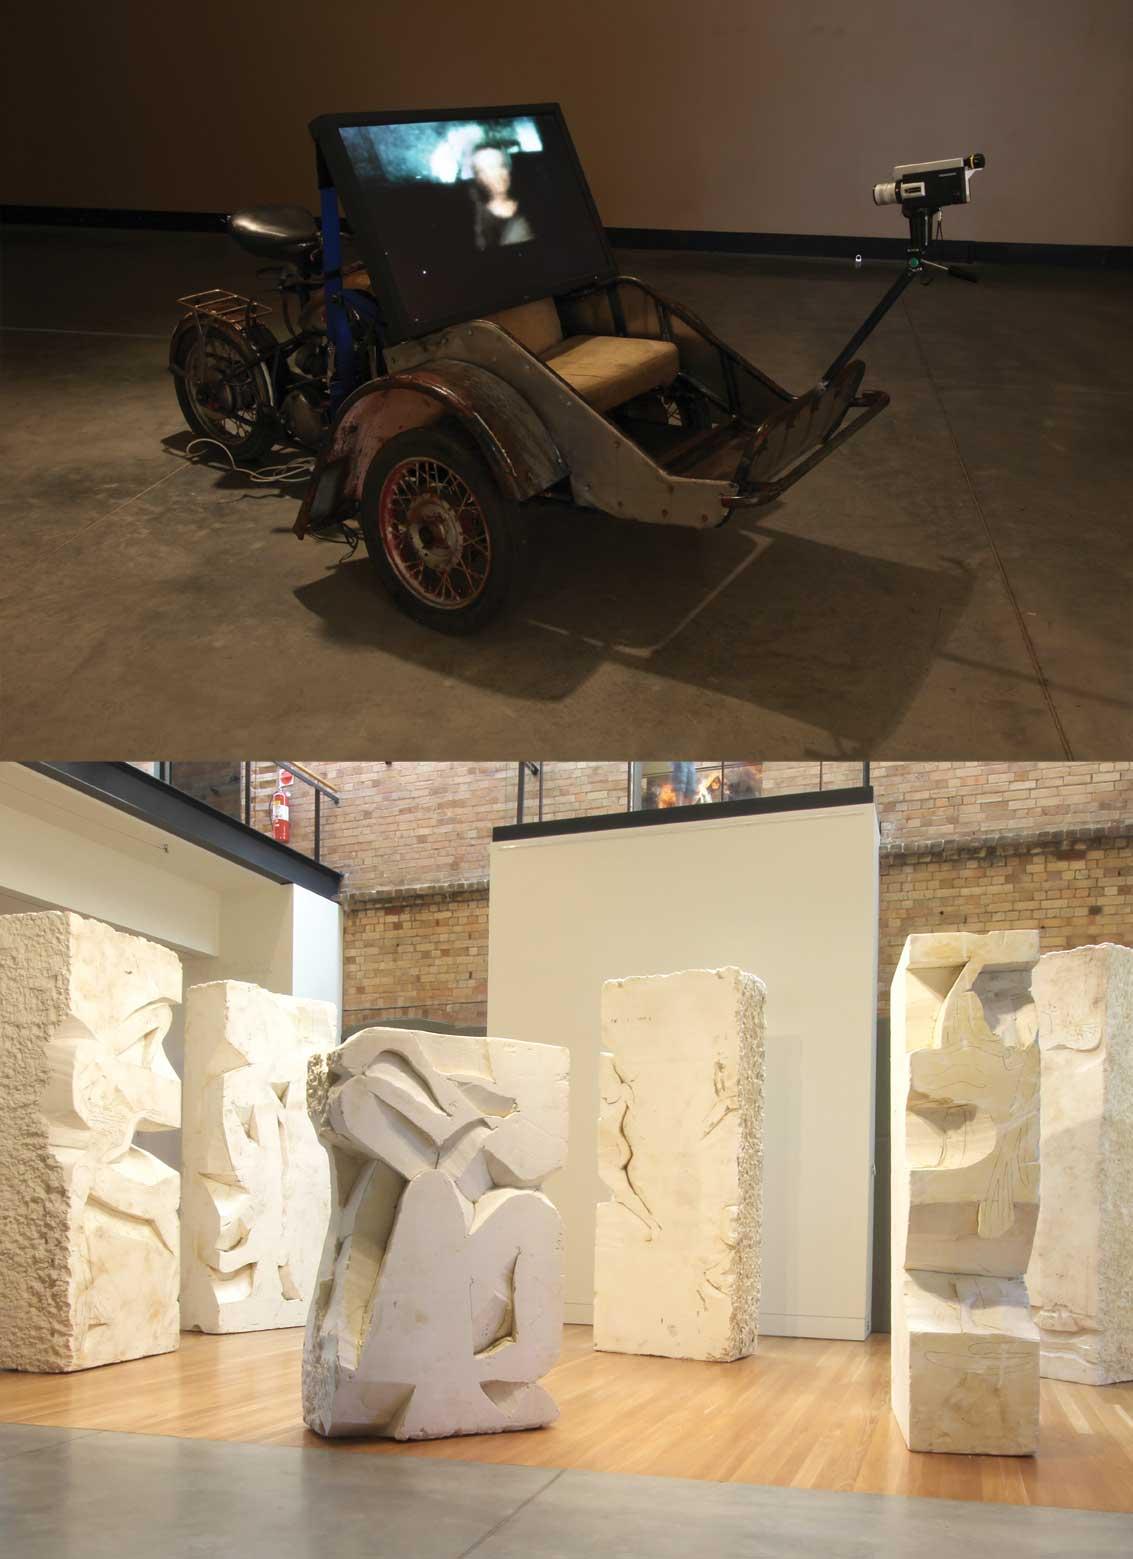 (top) Richard Goodwin, Proof of Consciousness Experiment 2, 2012, mixed media,120 x 260 x 130 cm (lower) Michael Snape, installation shot, Maitland Regional Art Gallery